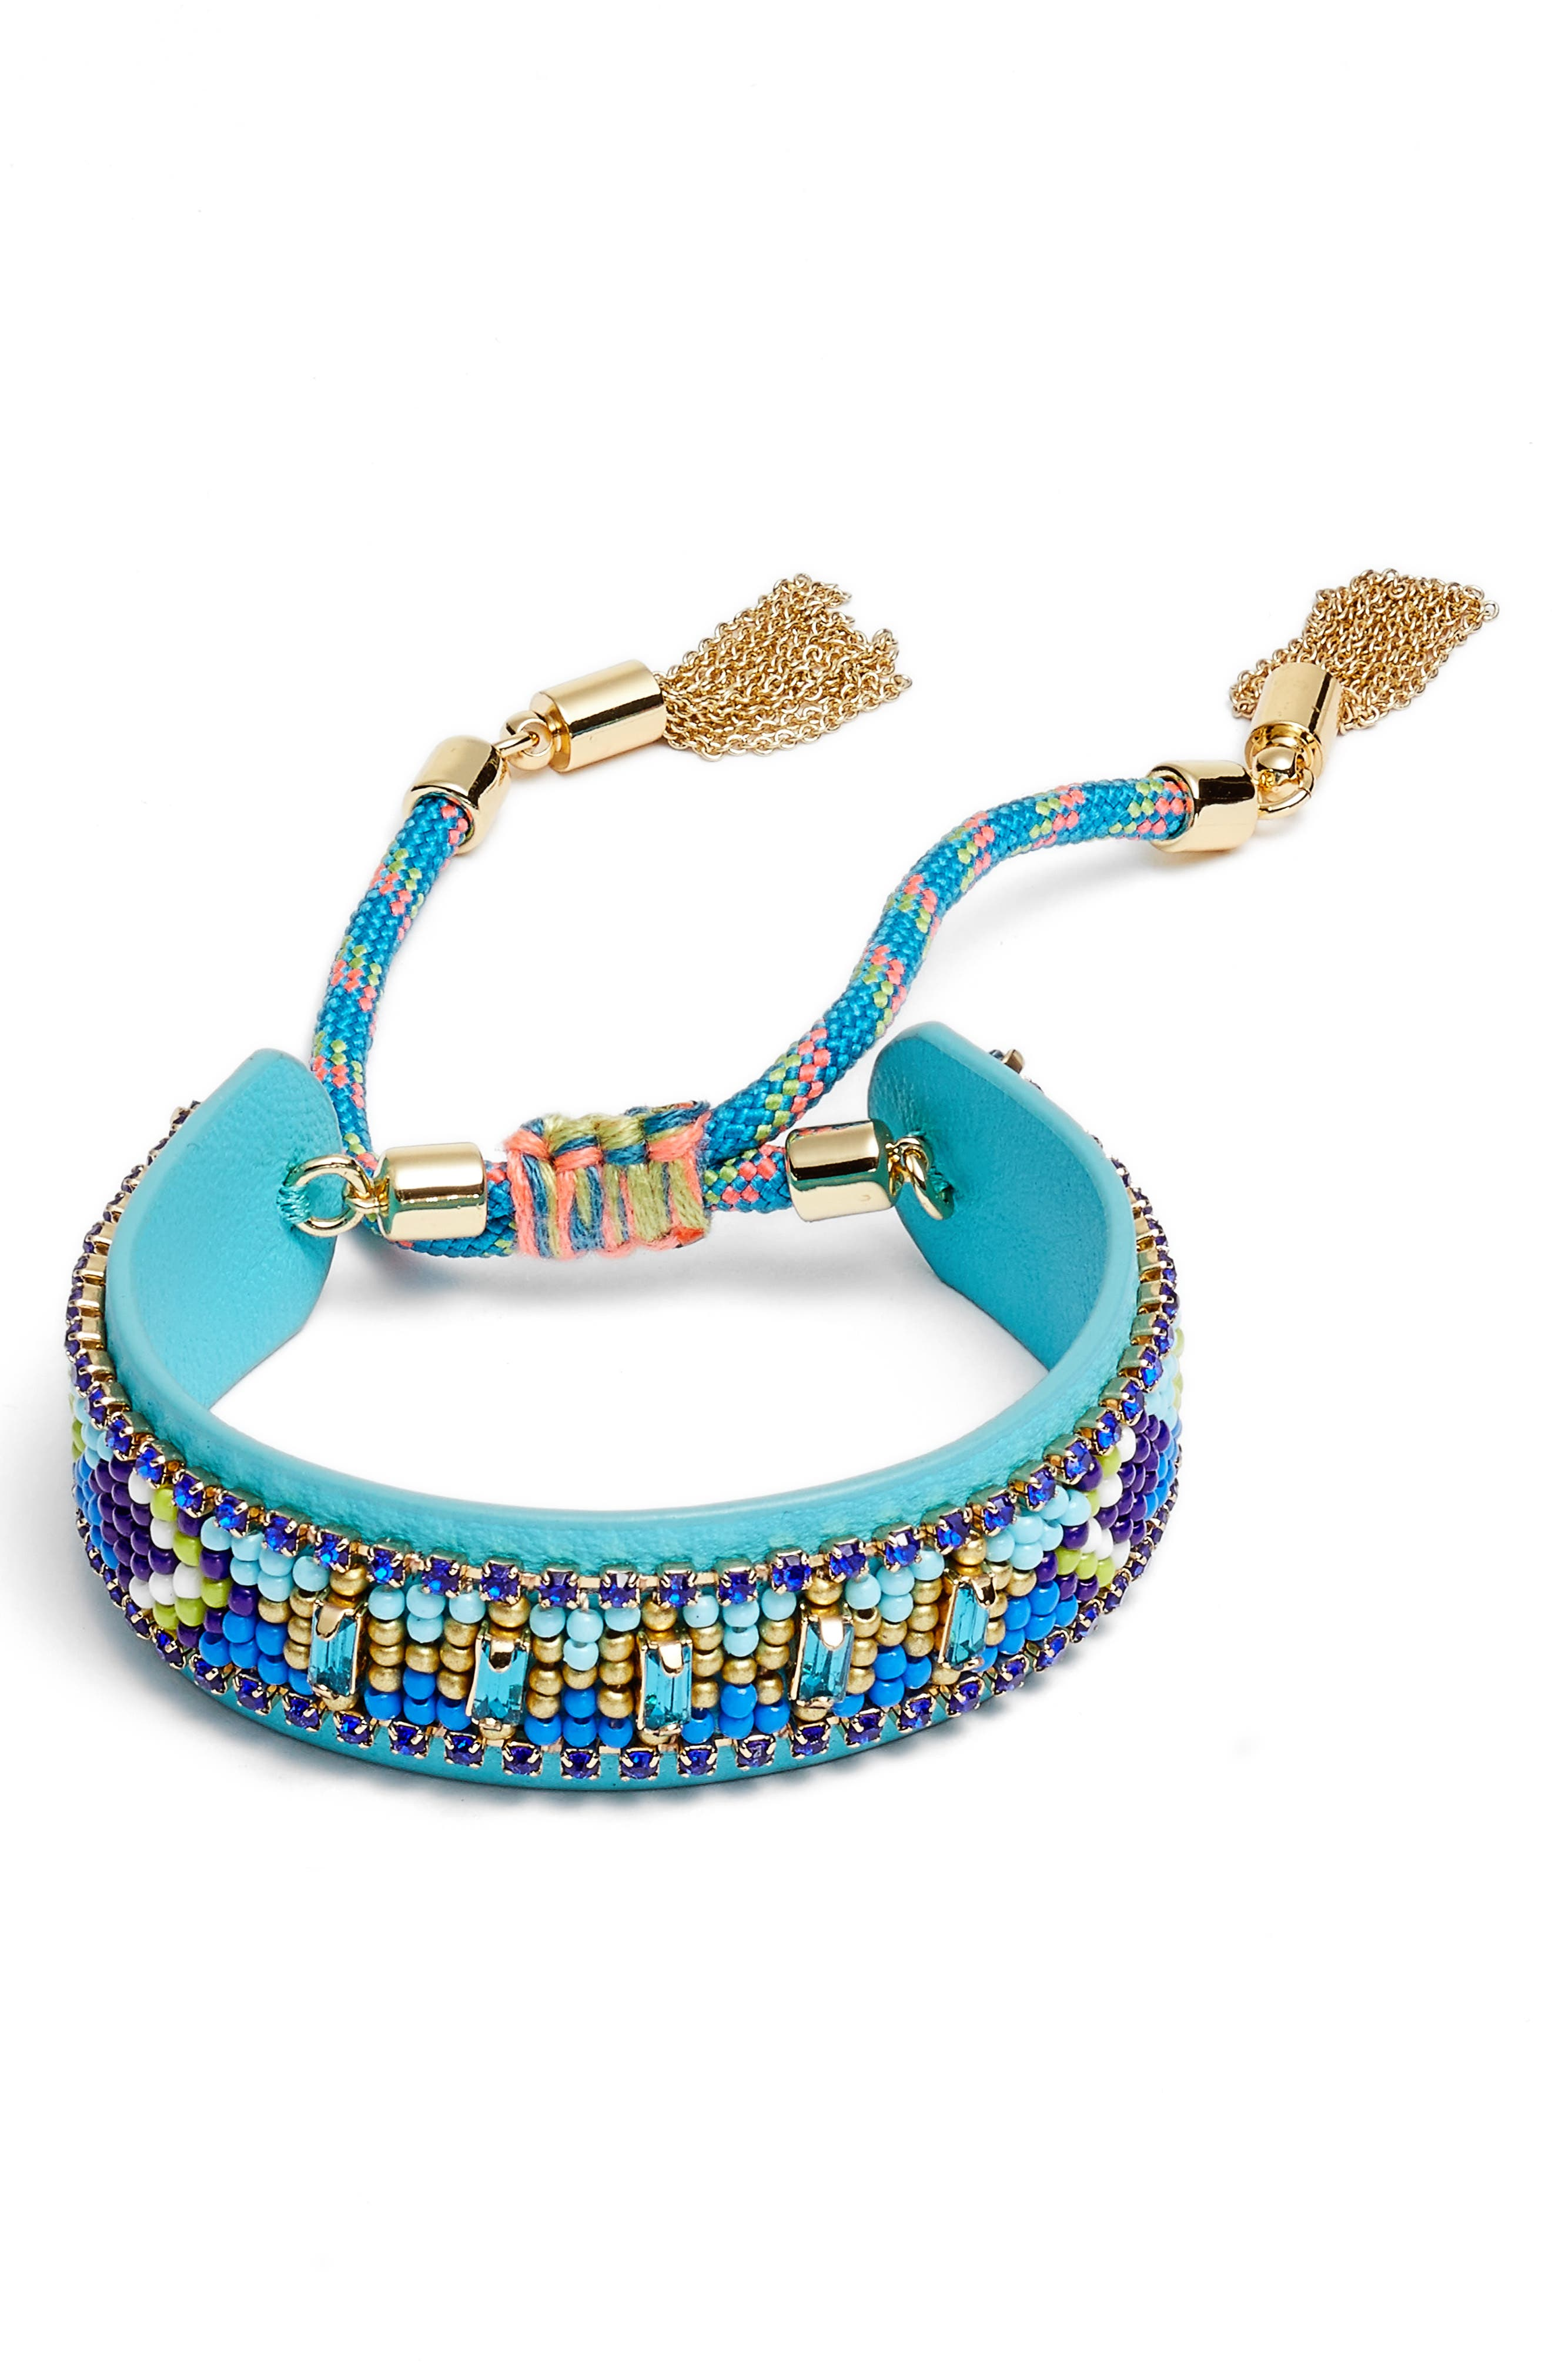 Zigzag Beaded Leather Friendship Bracelet,                             Main thumbnail 1, color,                             Turquoise Multi